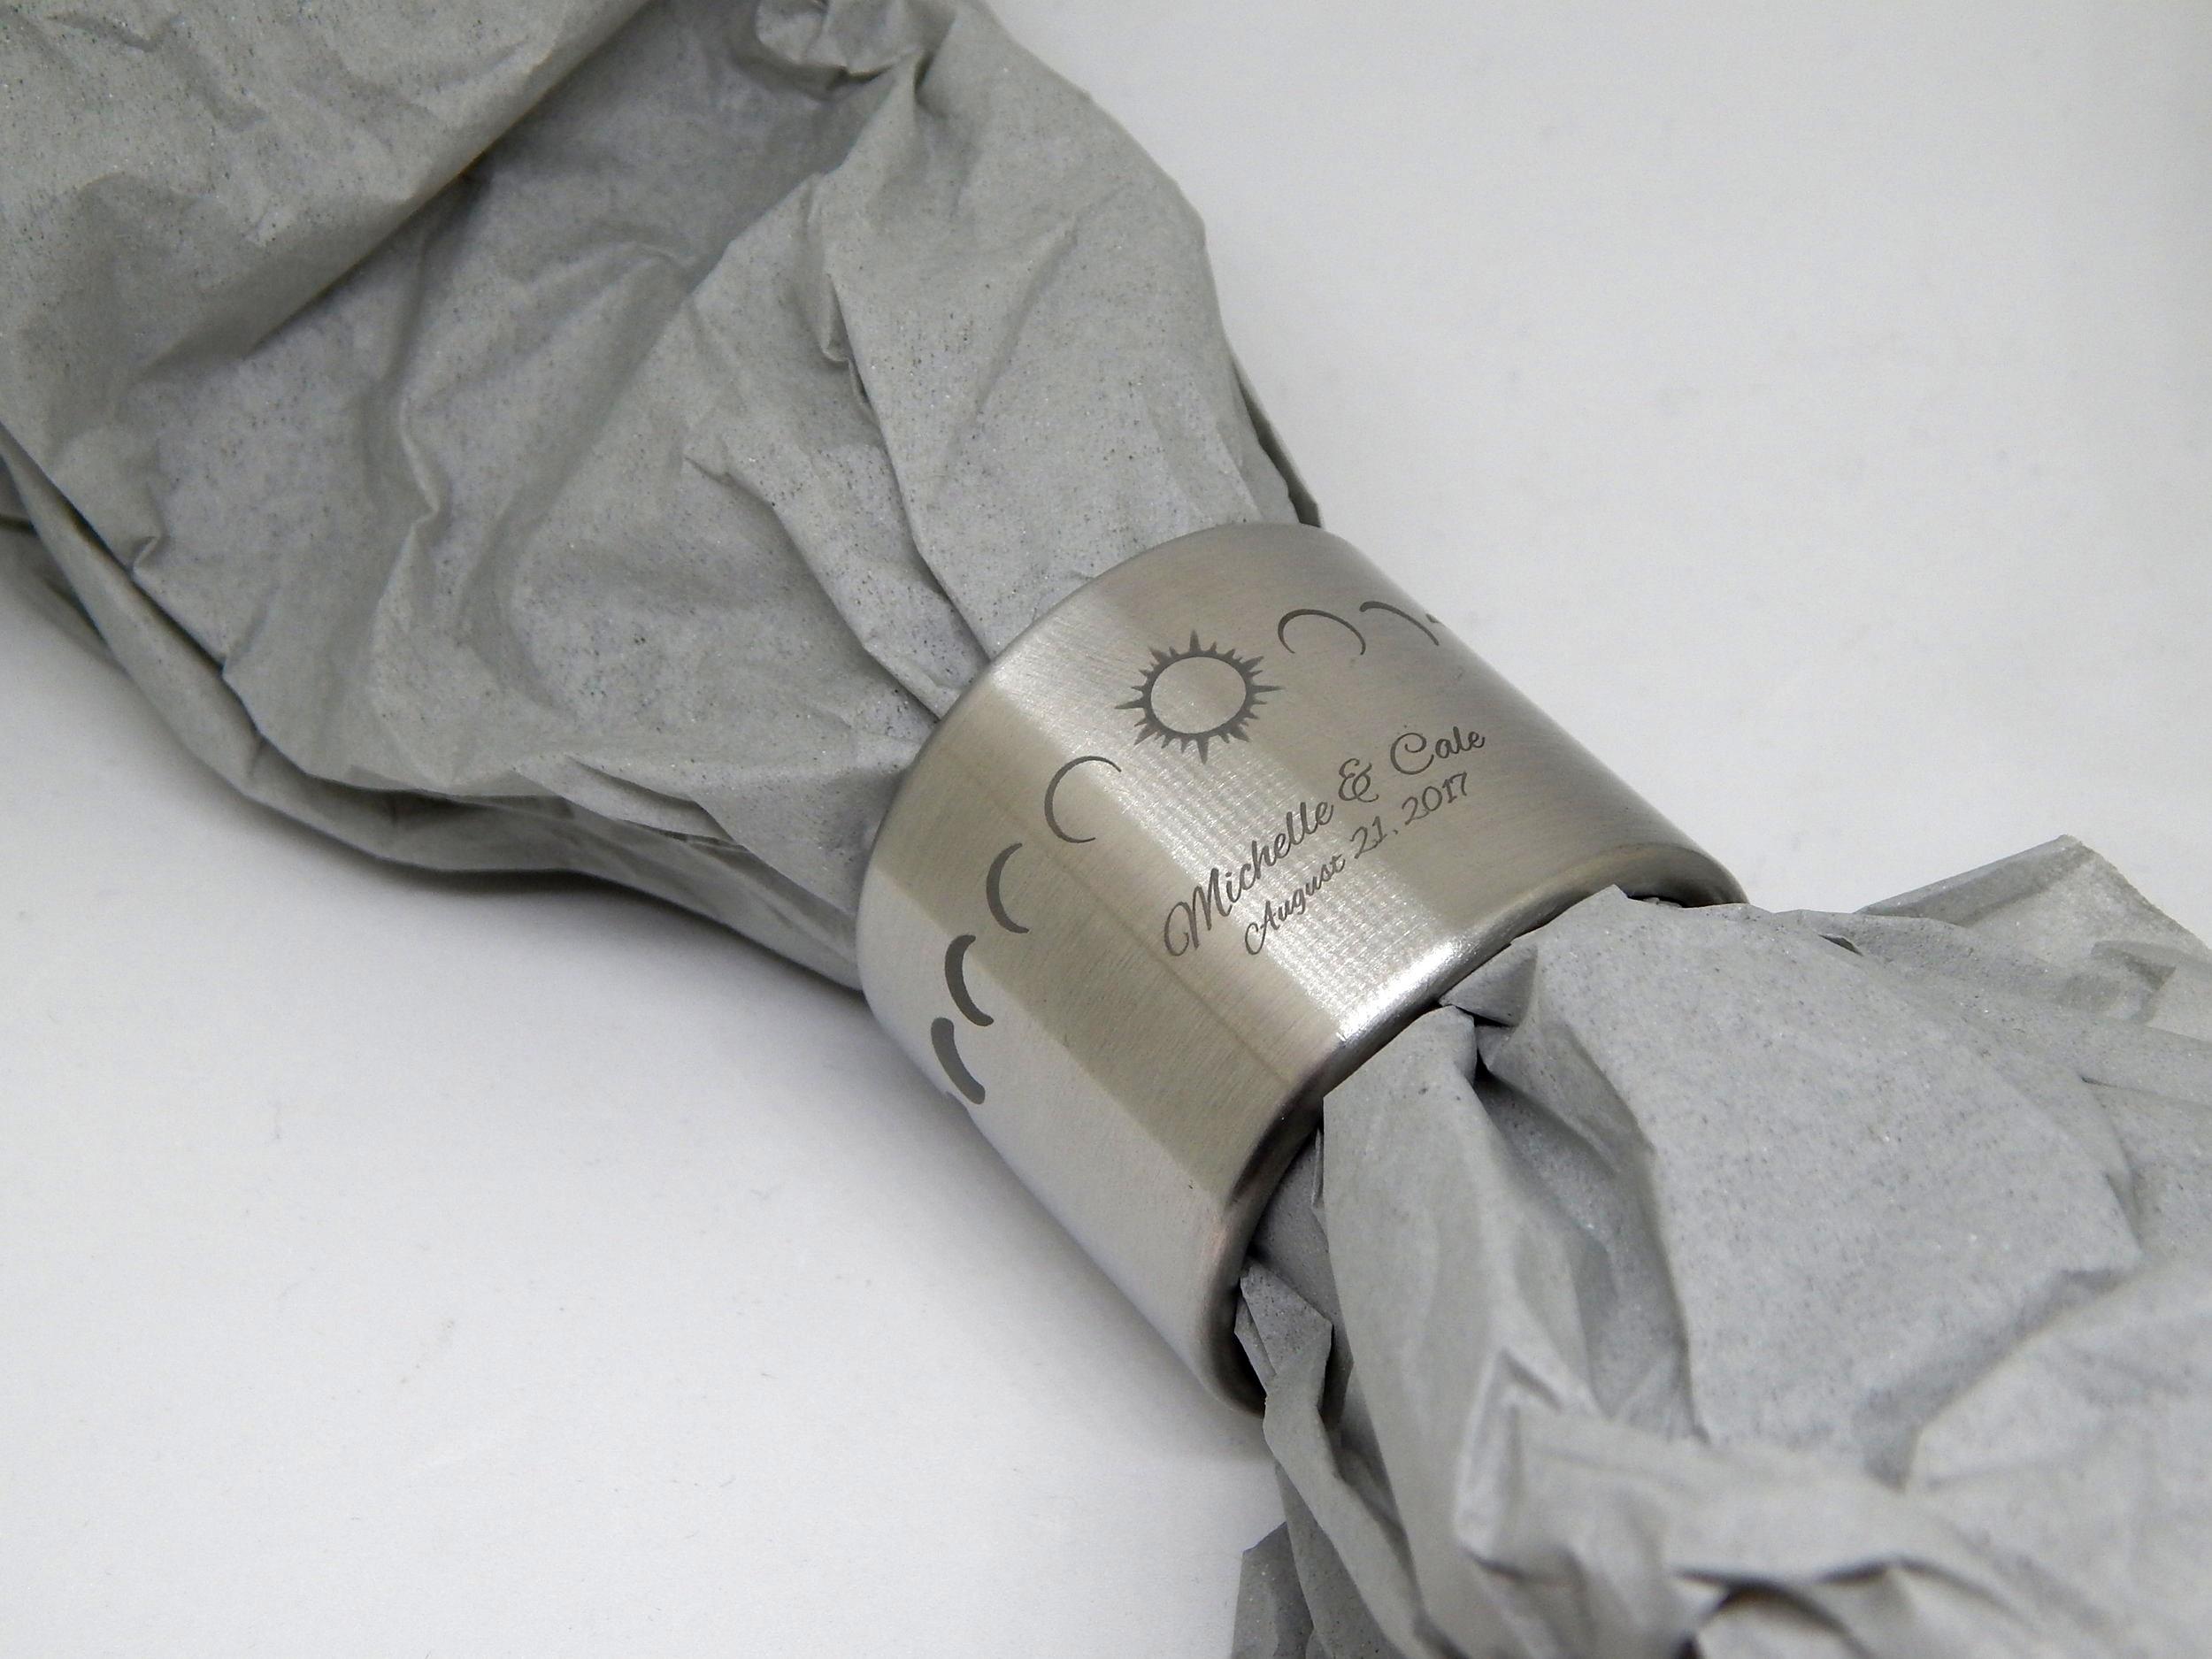 Celebratory napkin ring set engraved with their wedding date.